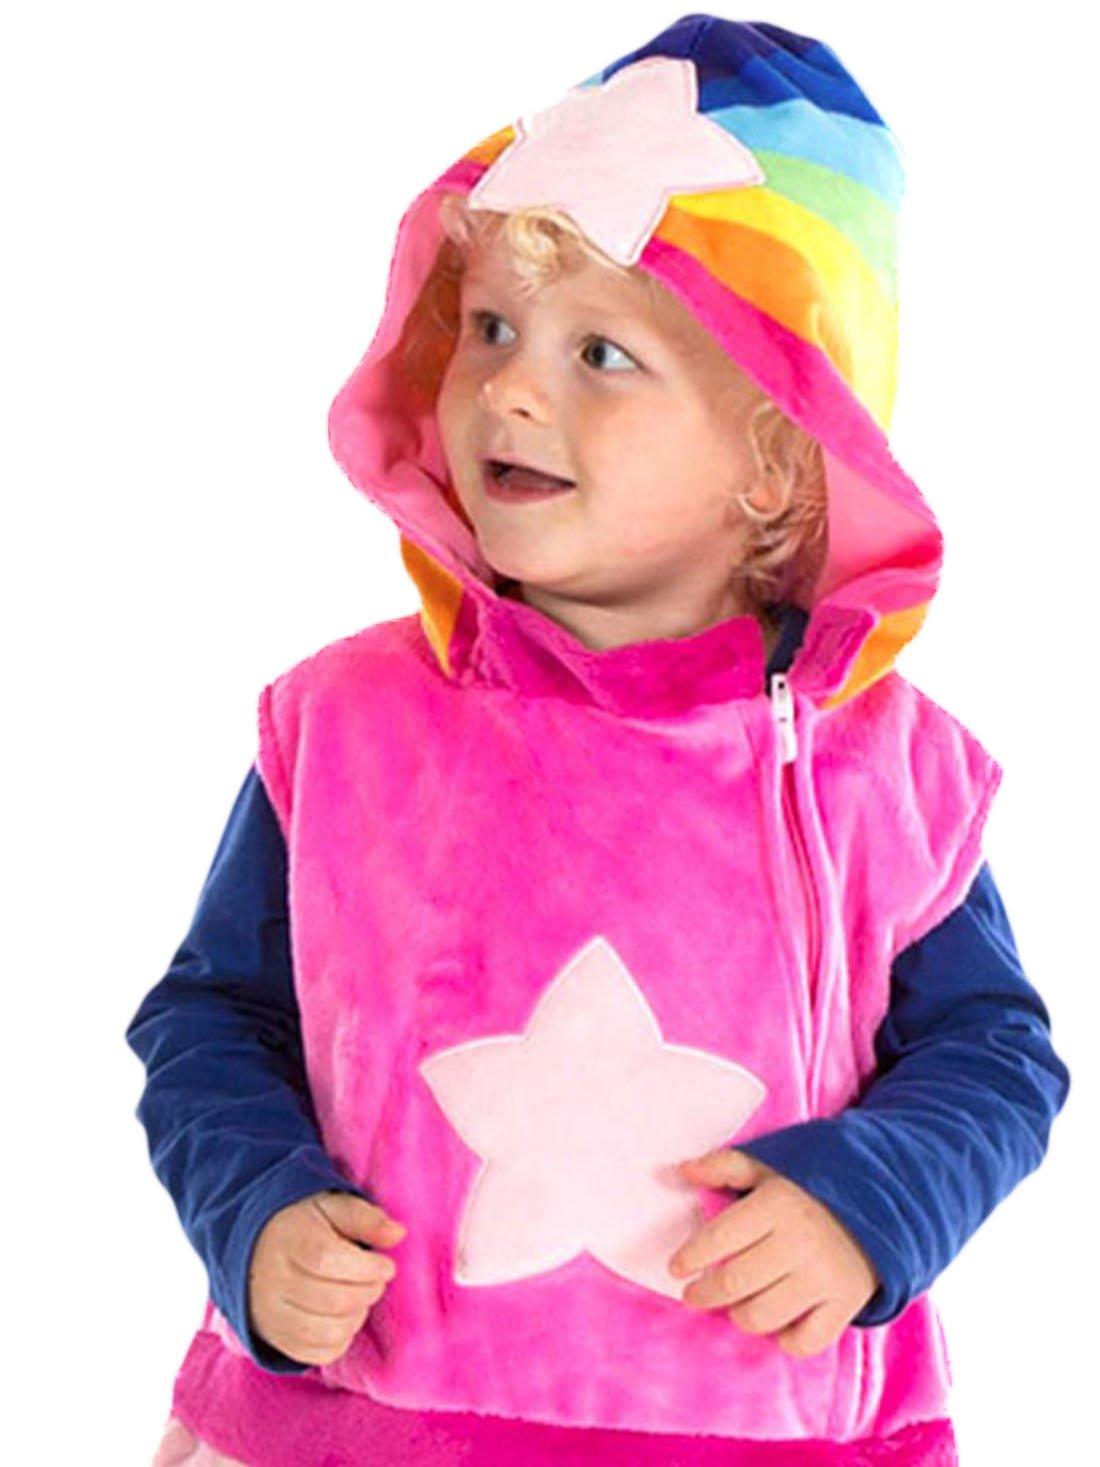 Karnevalsbud - Mädchen Mädchen Mädchen Wolkenkind Baba Rosa Karneval Kostüm , Mehrfarbig, Größe 92-98, 2-3 Jahre e720af